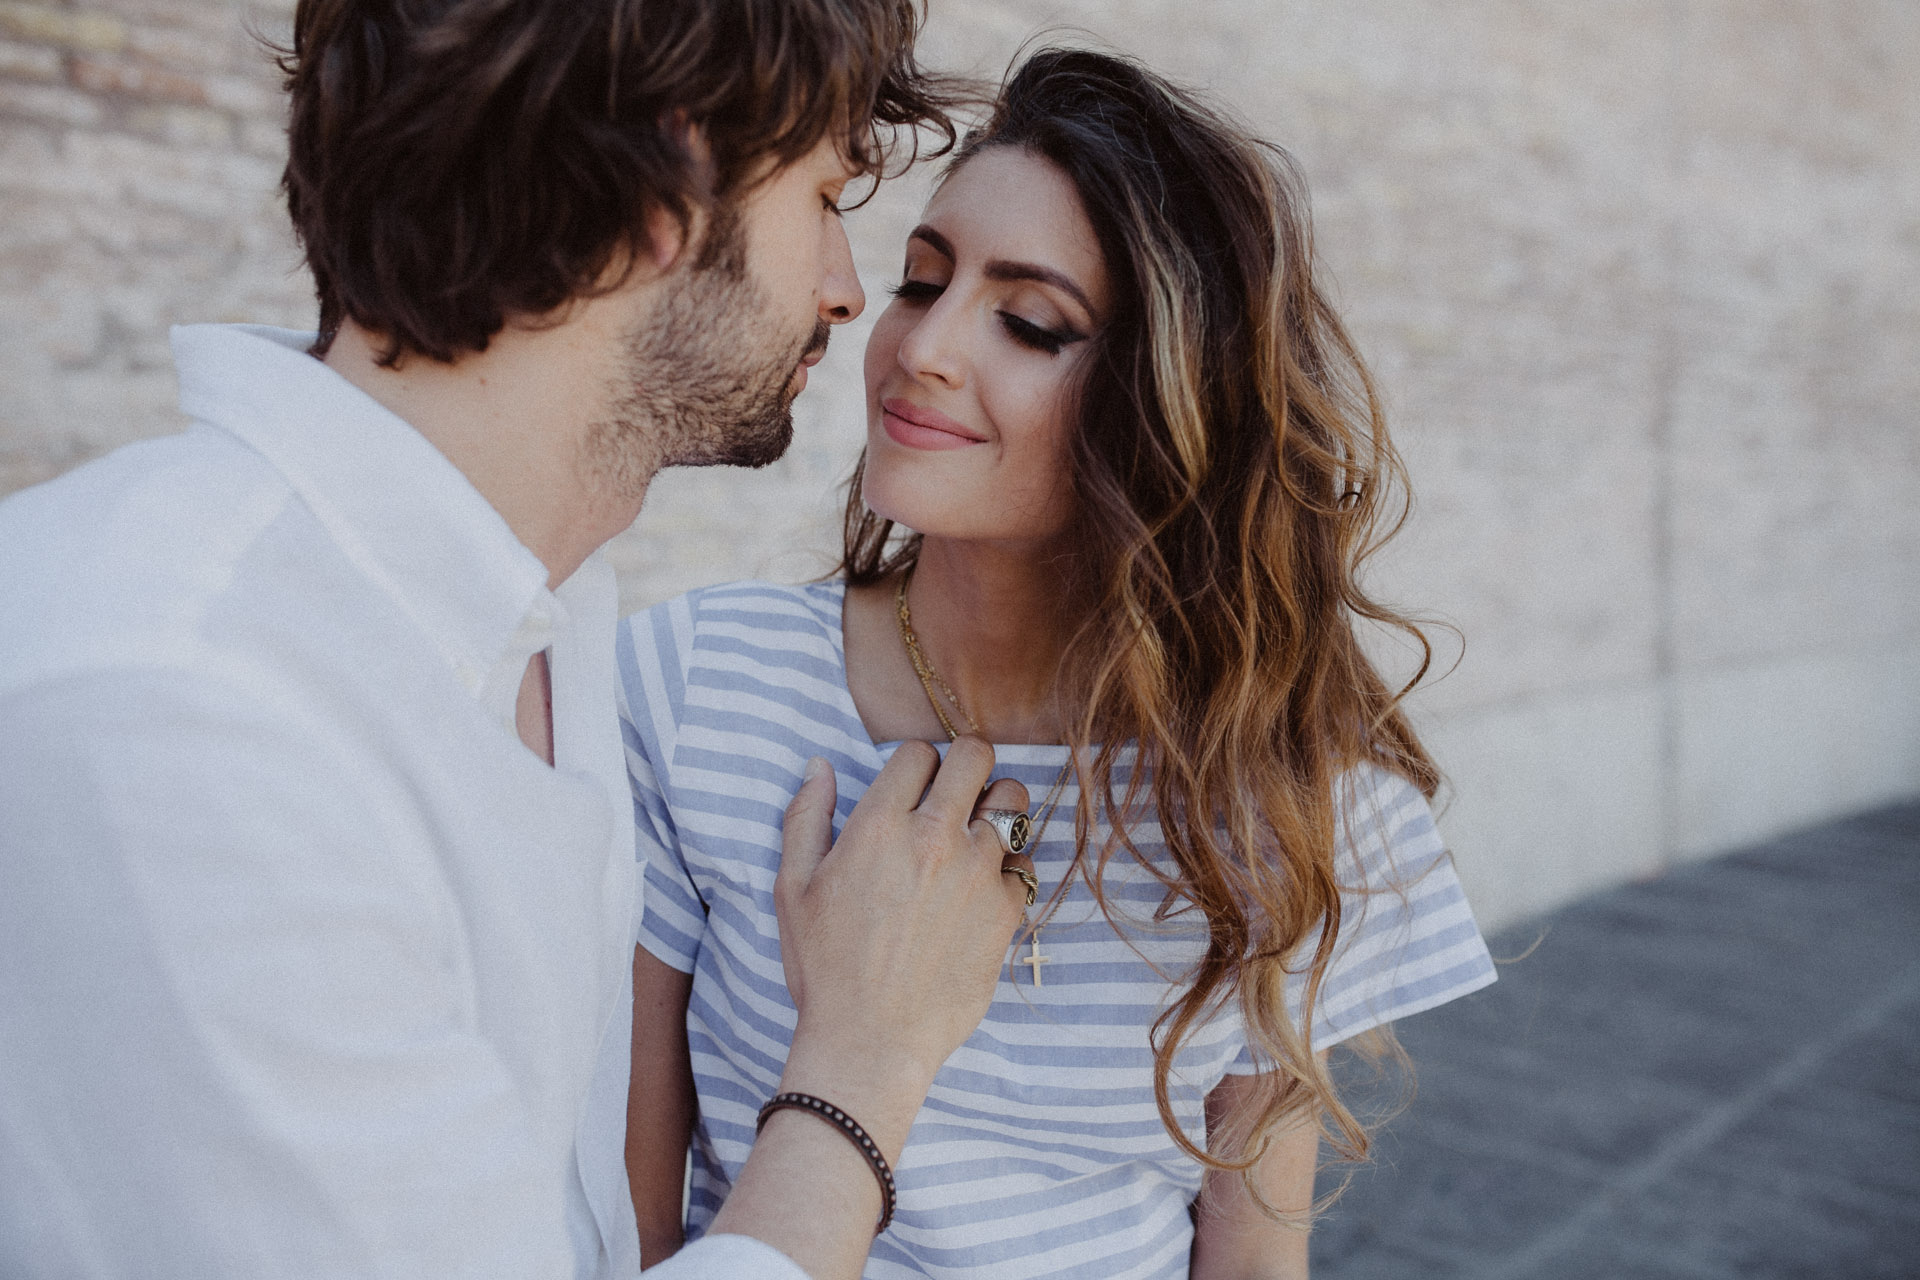 coupleshooting-roma-hochzeitsfotografen-wien-agnesundandi-20